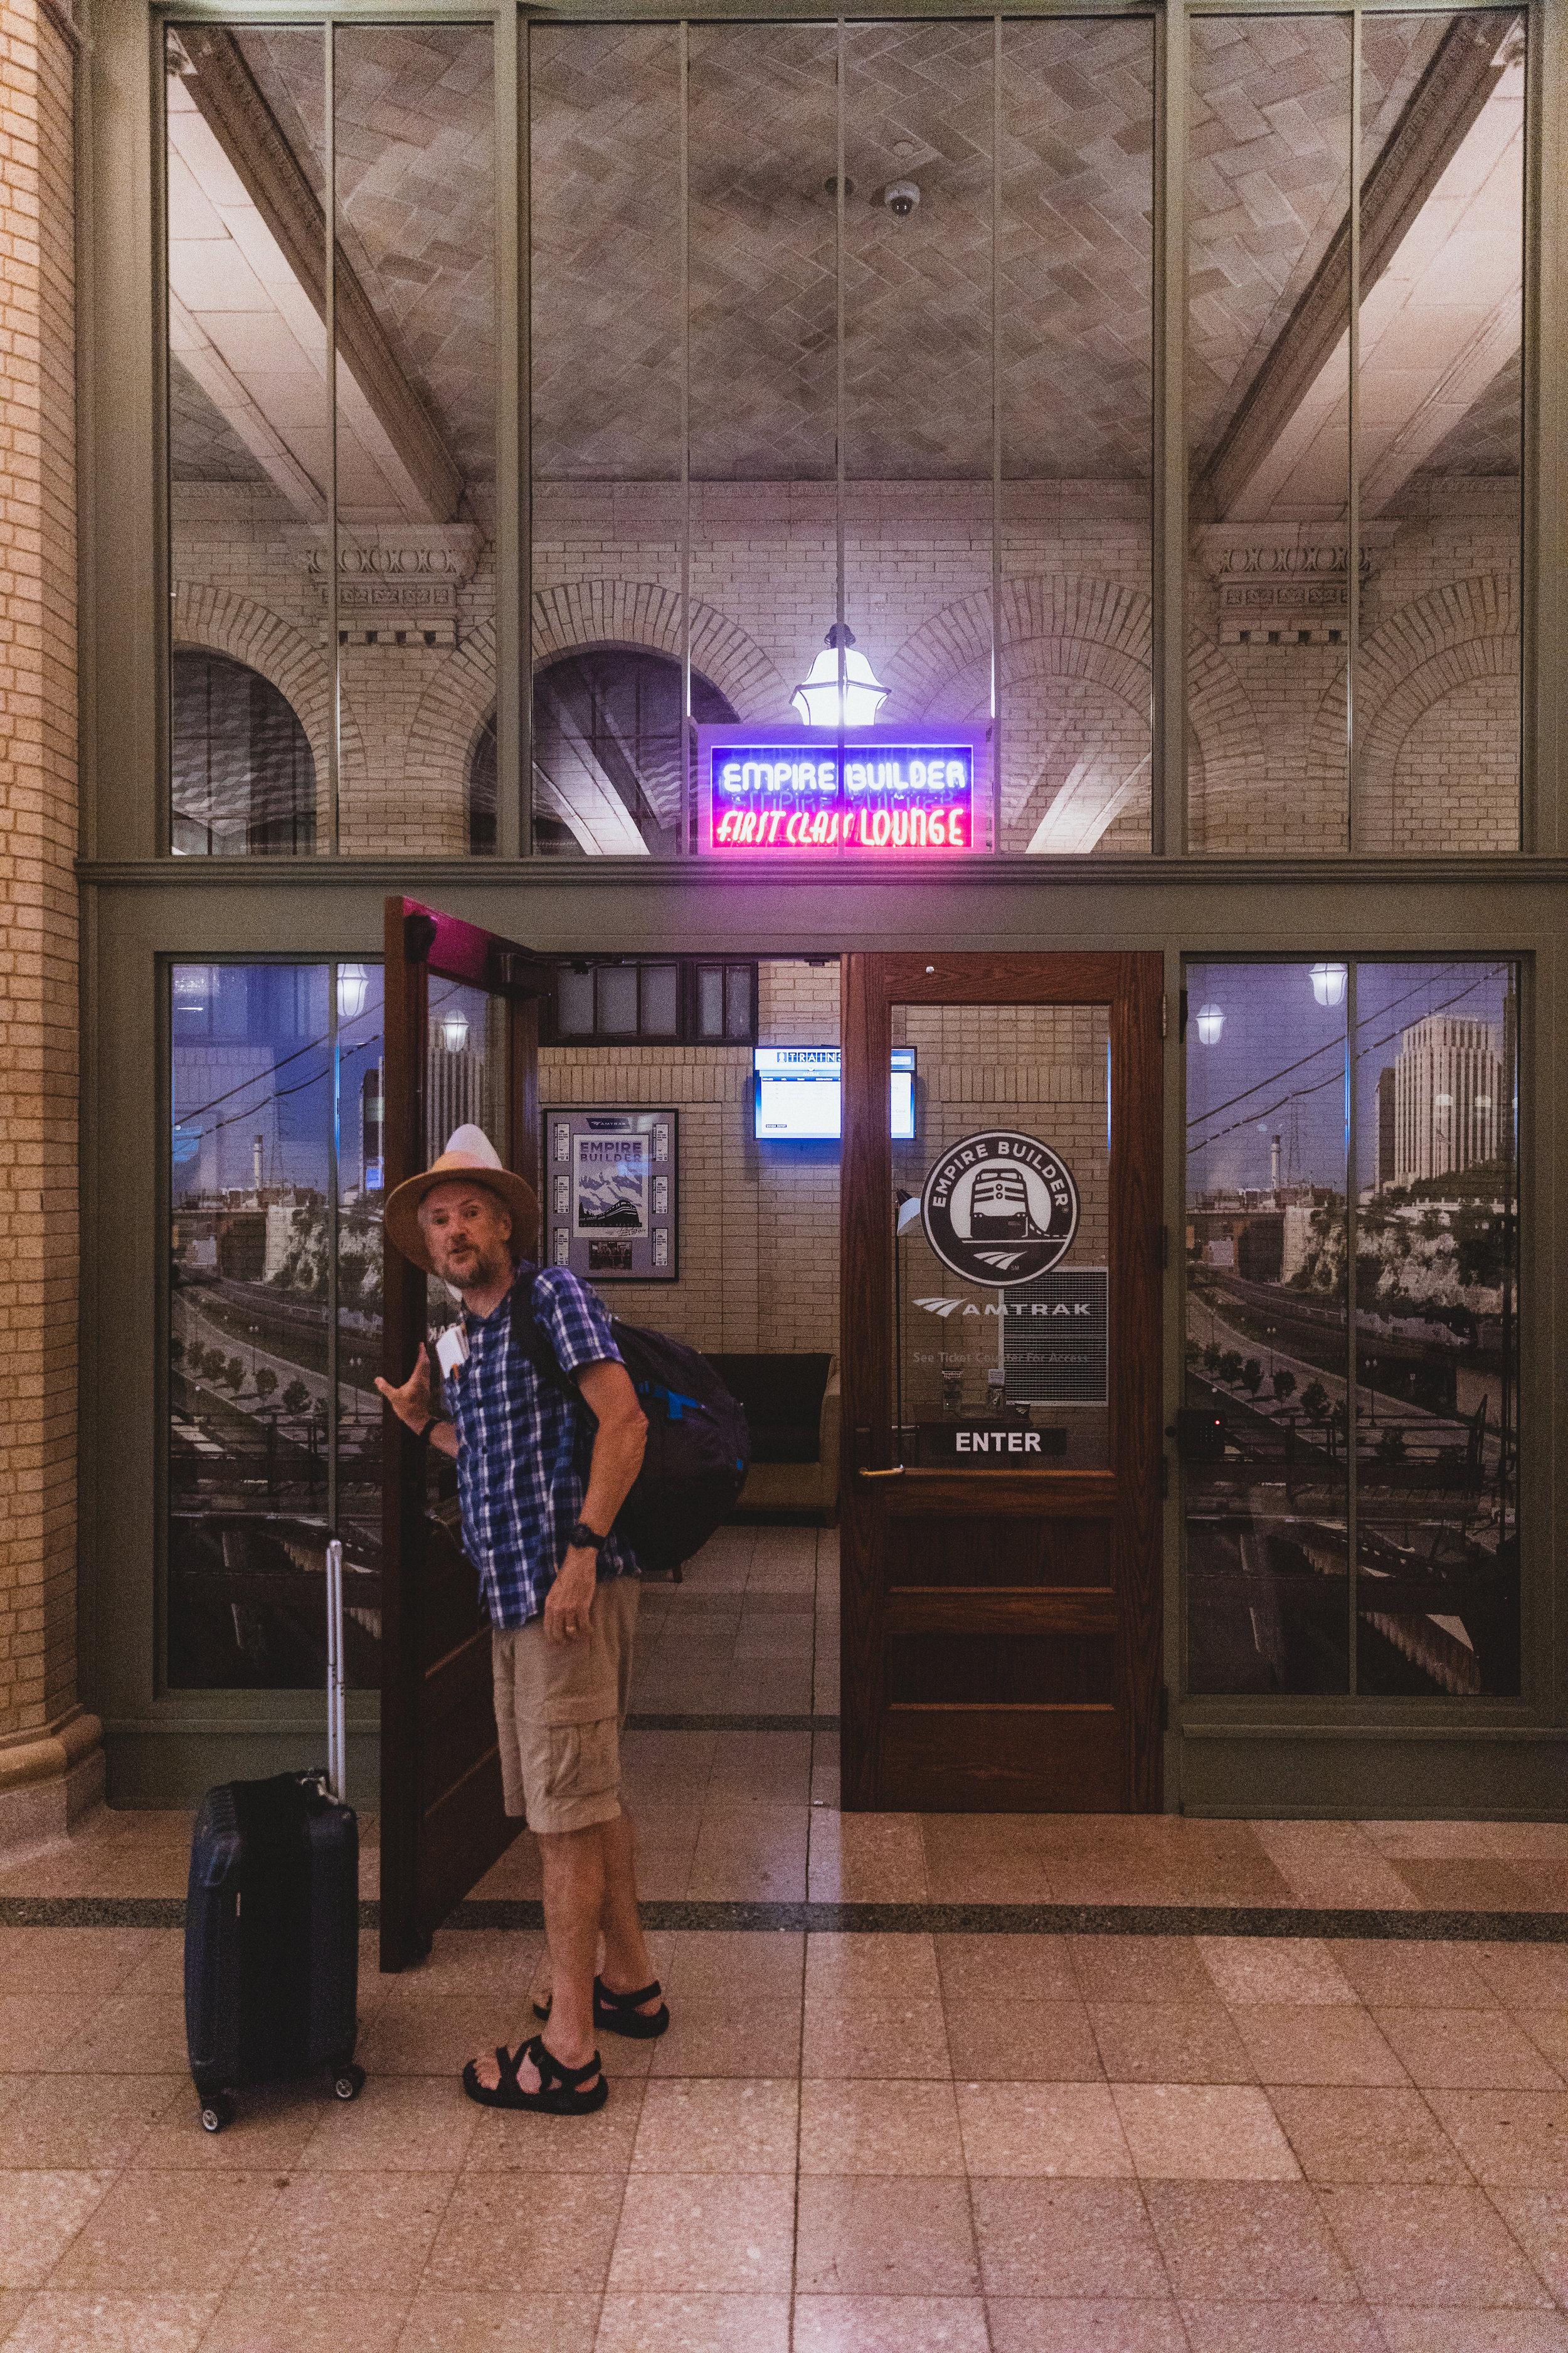 Amtrak Edits-6.jpg